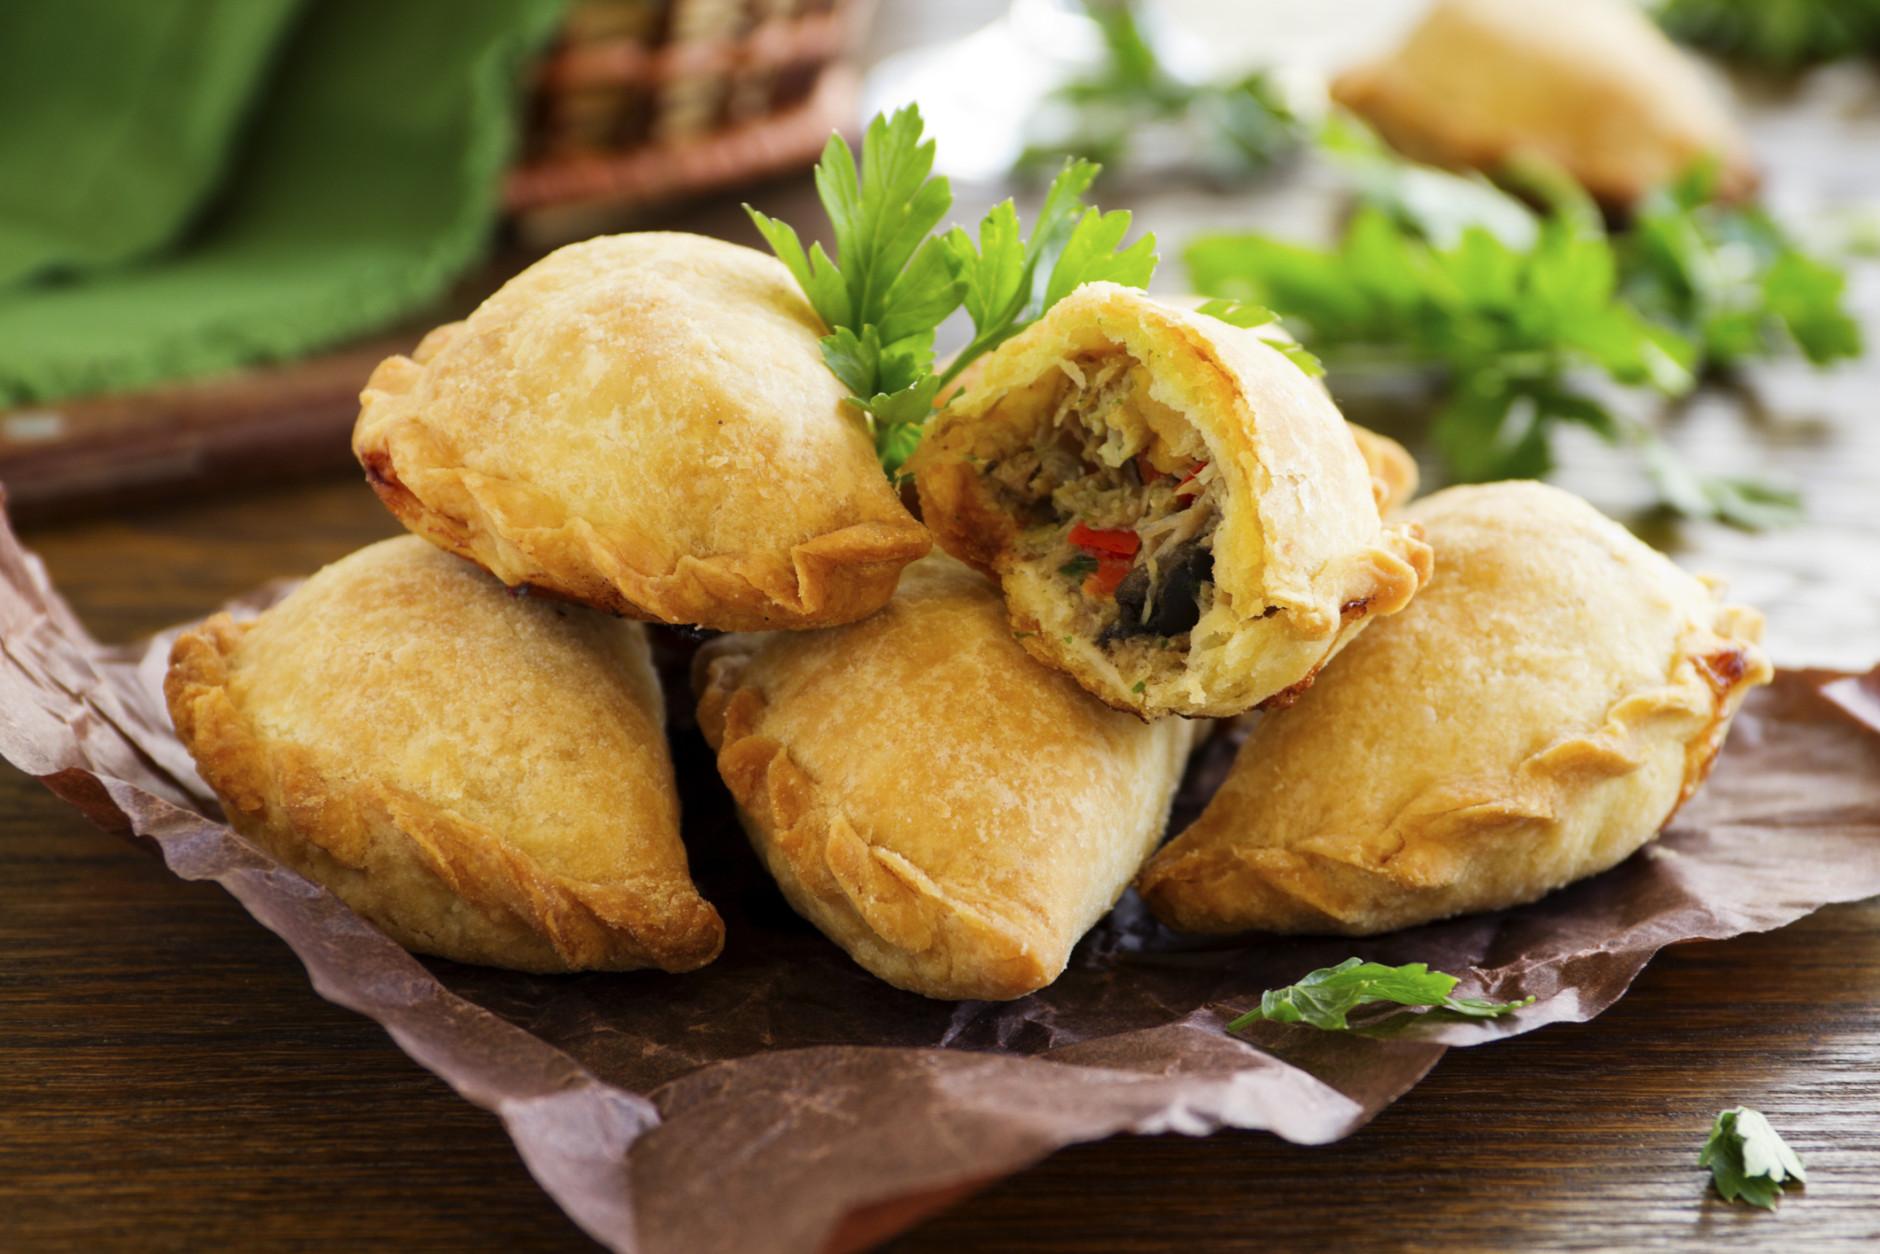 - A simple empanada recipeItems we carry for this dish: empanada discs, herbs & spices